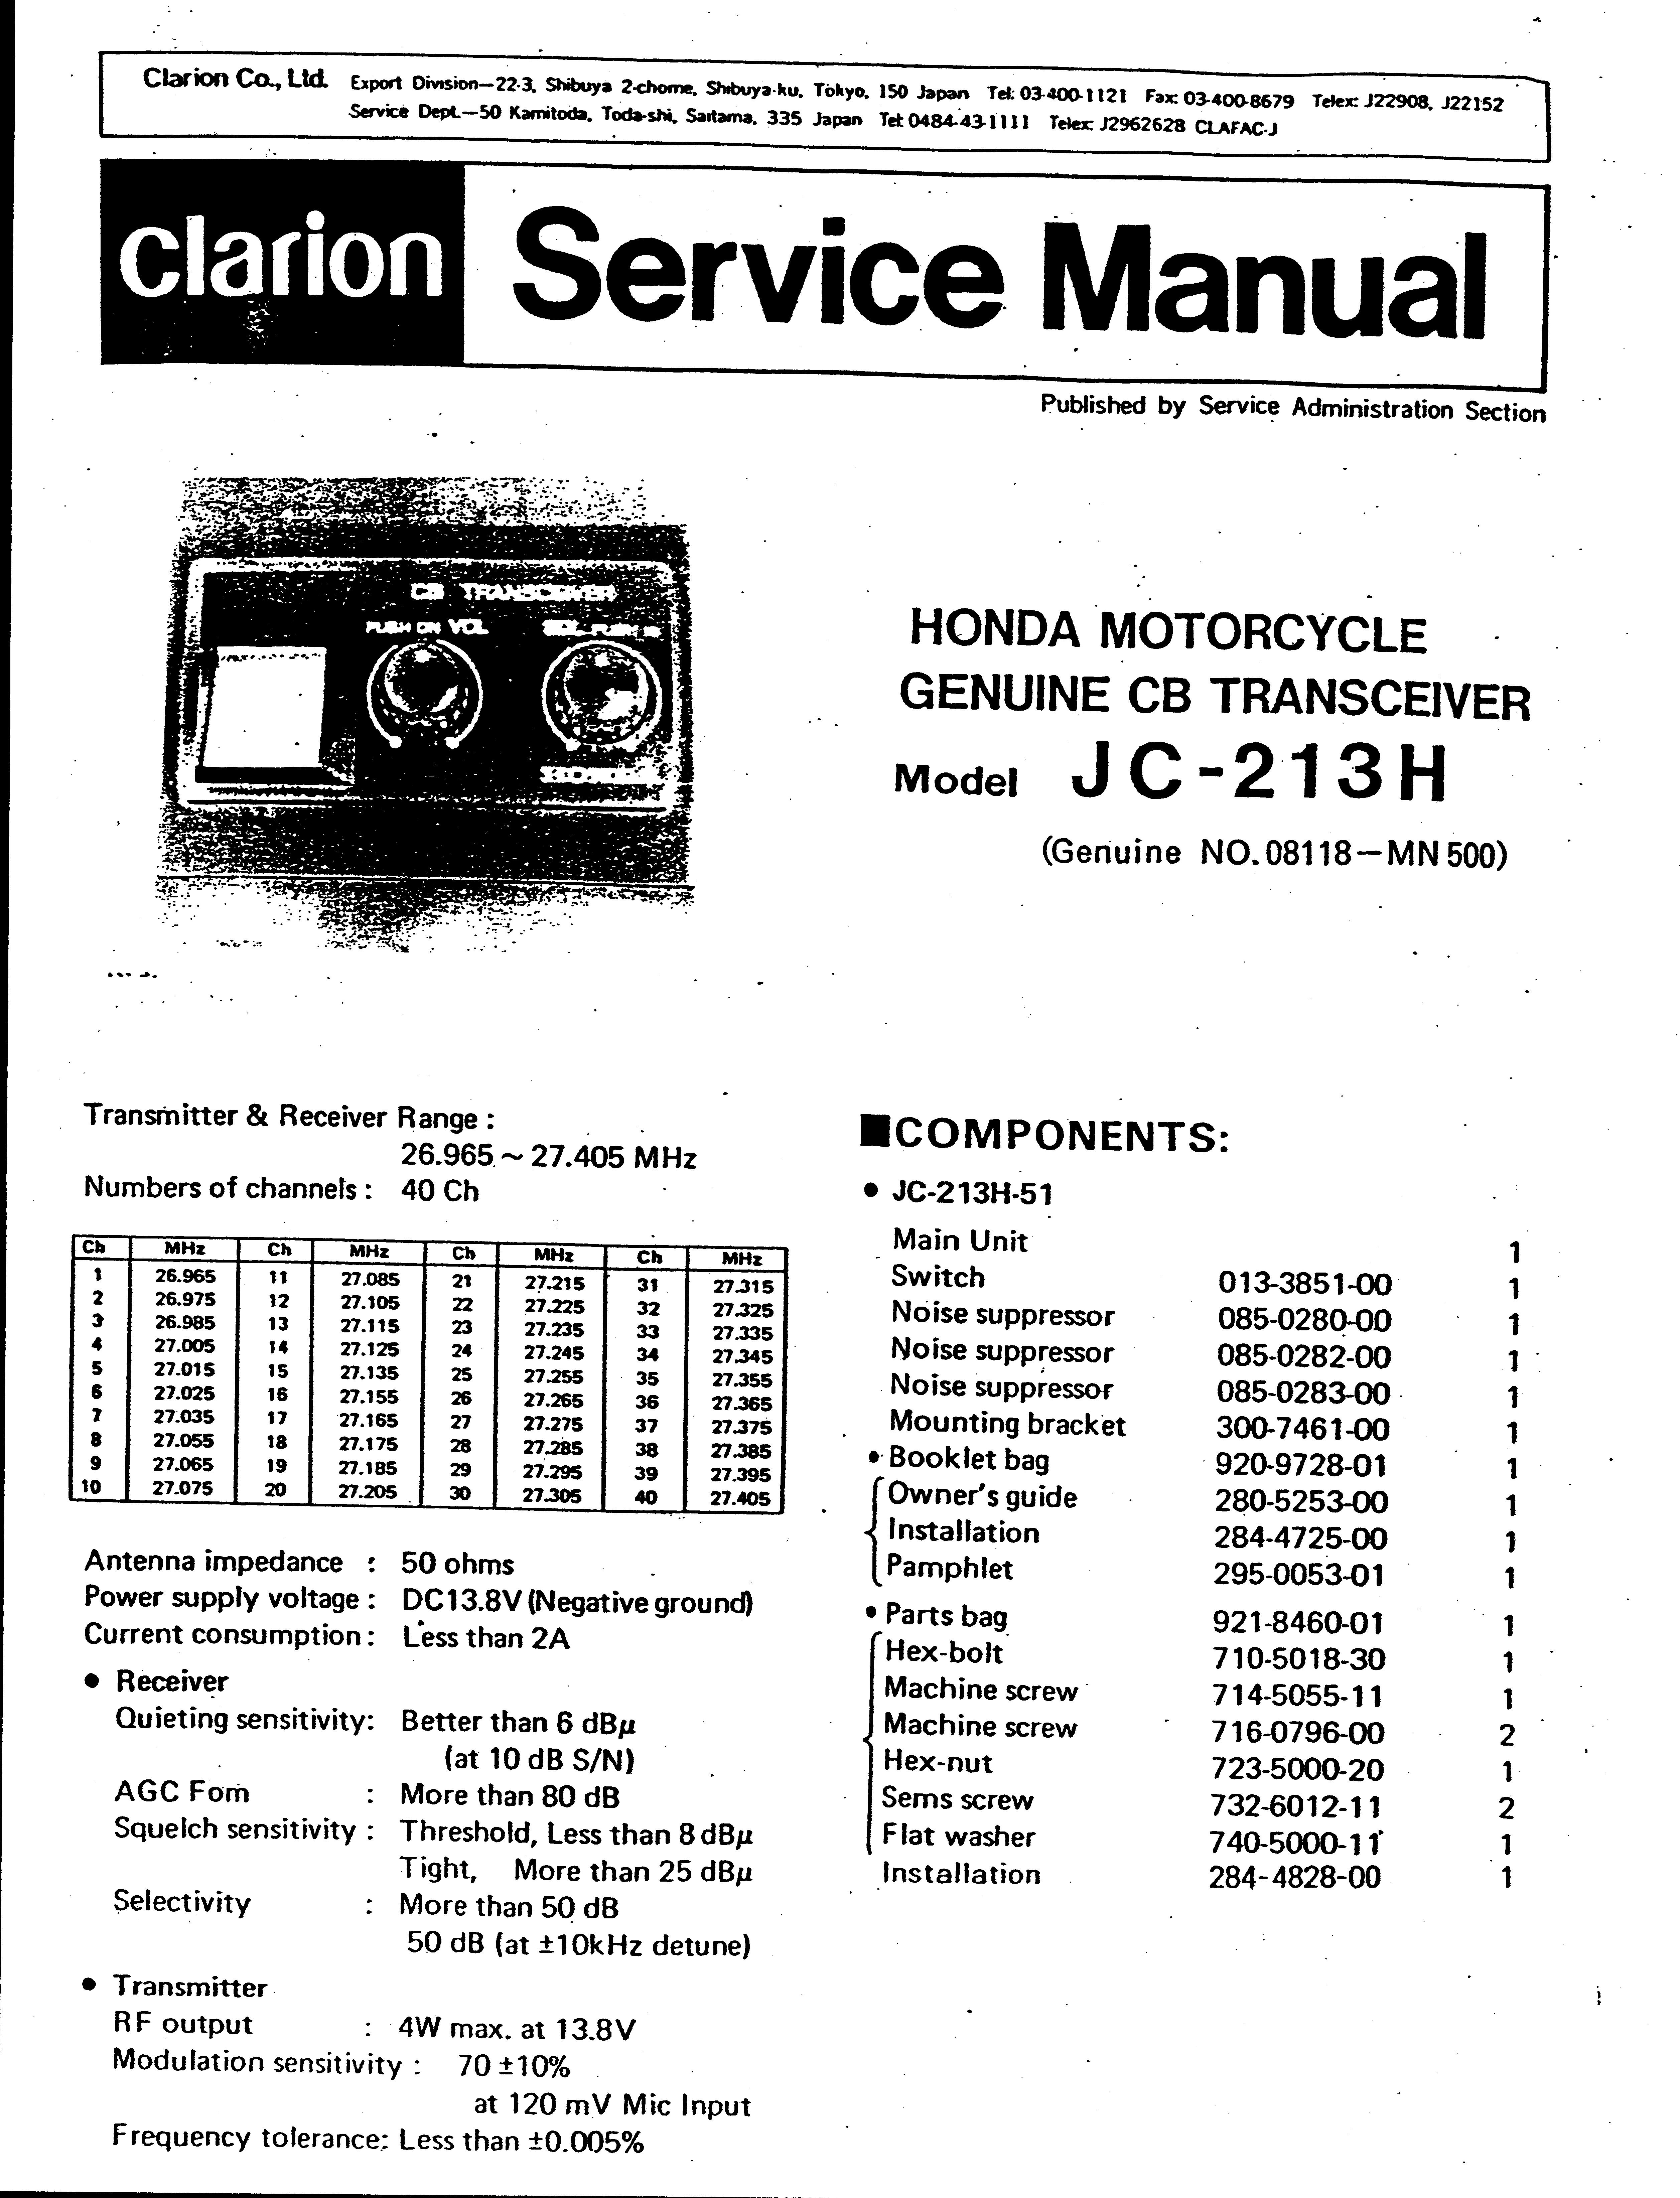 service manual for honda clarion cb transceiver 4 stroke net all rh 4 stroke net Honda Service Manual PDF Honda Service Manual PDF